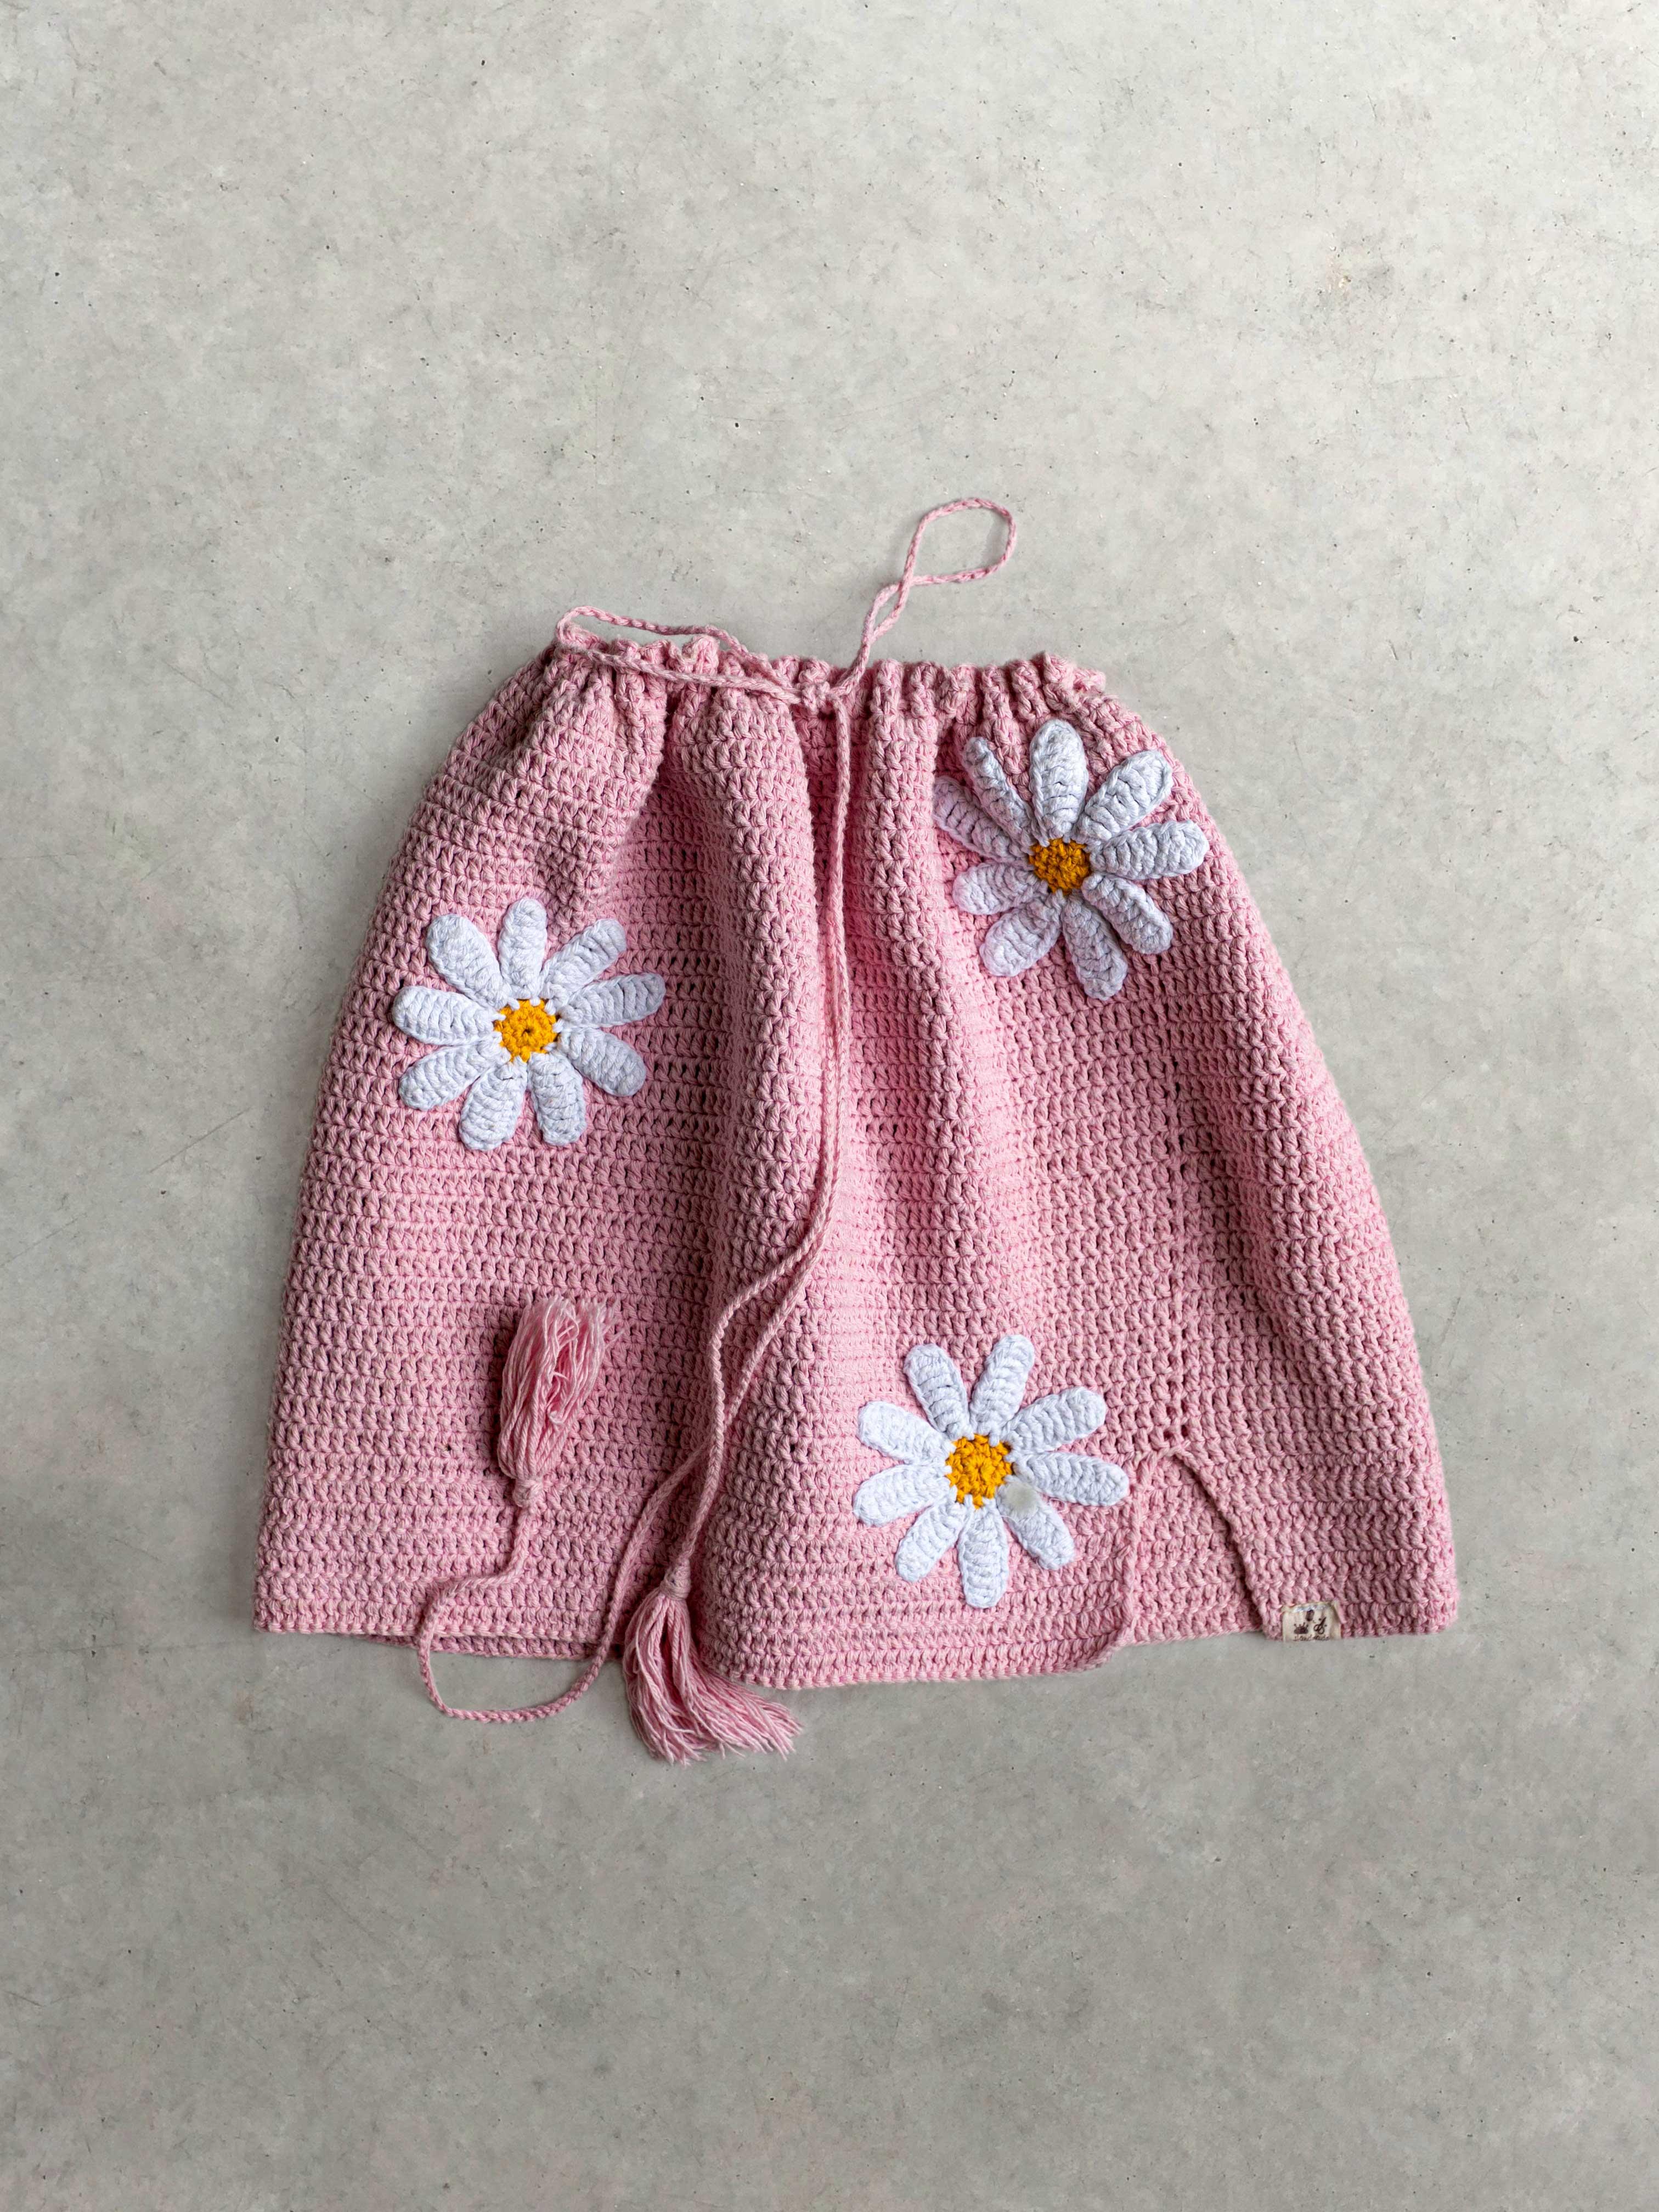 Packshot de Jupe crochet rose  par la marque Mathilda Roks